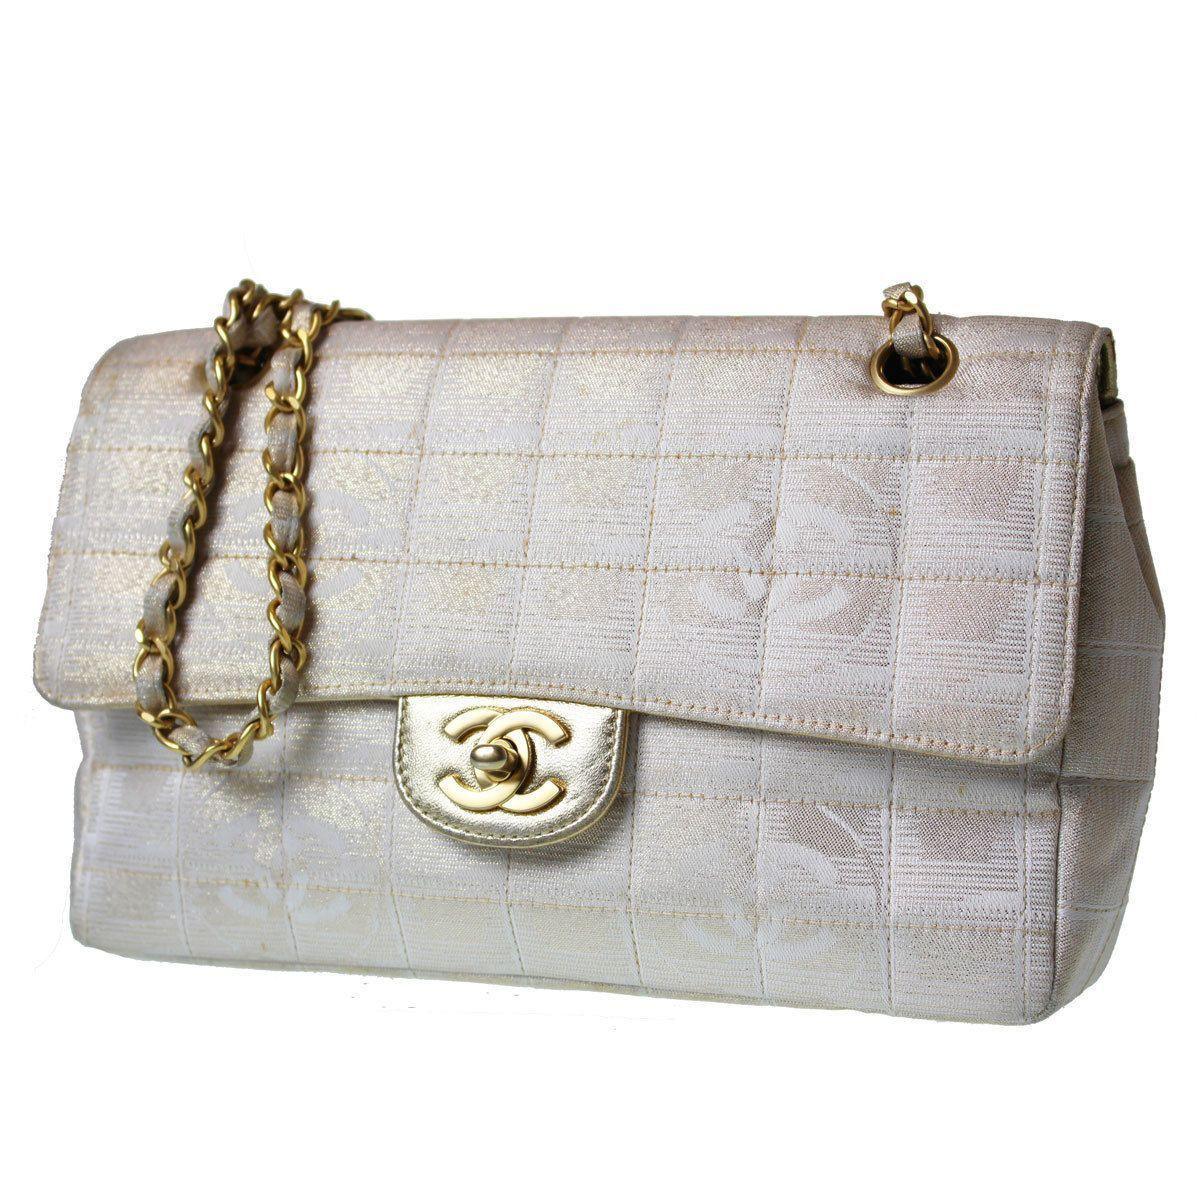 ce2293f04064db Vintage Authentic Chanel New Travel Line Chain Shoulder Gold Beige Canvas  Bag